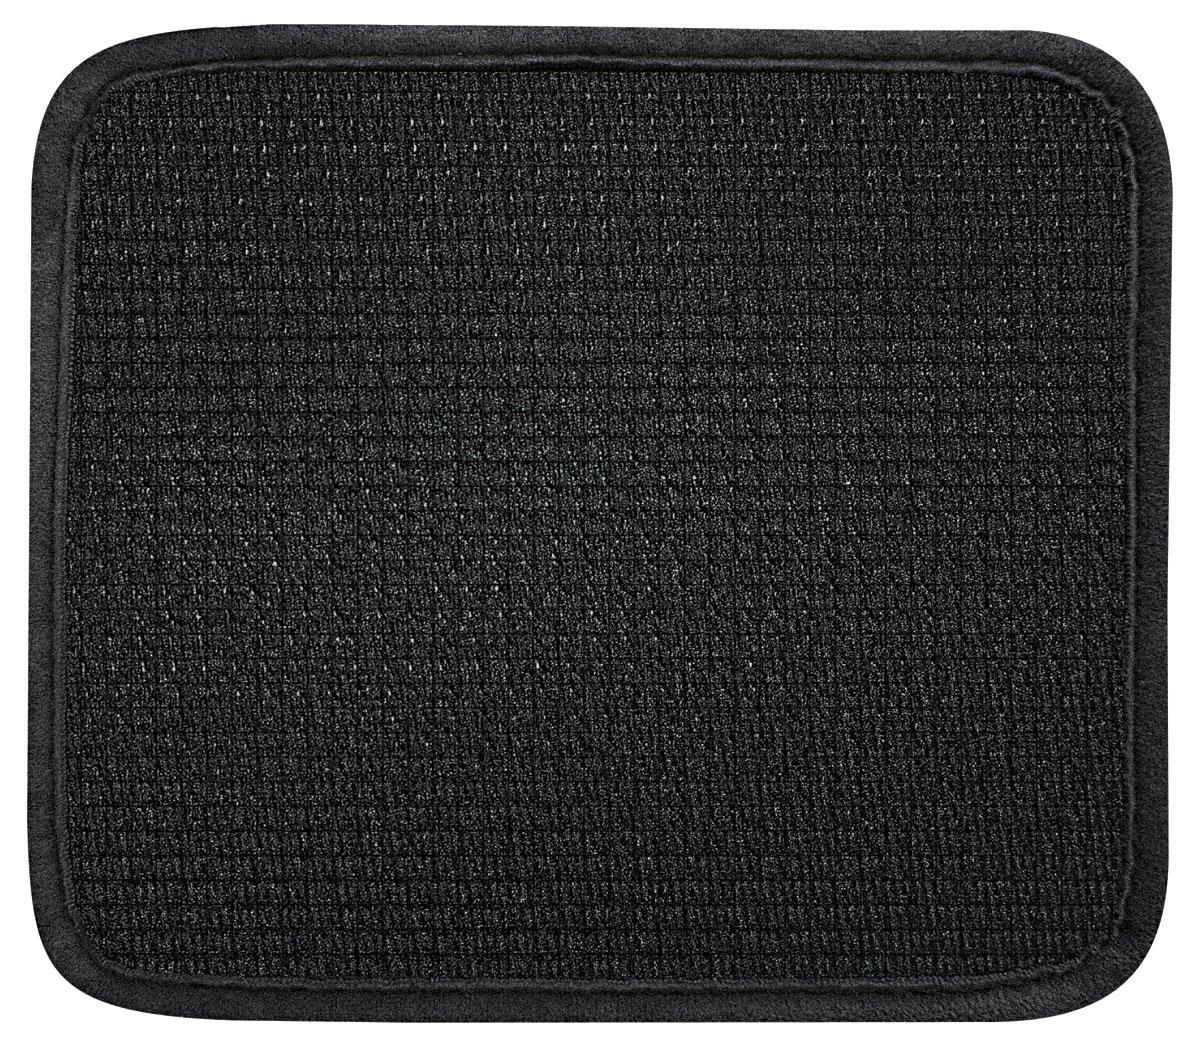 Premium Carpet, Mocha DashMat Original Dashboard Cover Cadillac Escalade